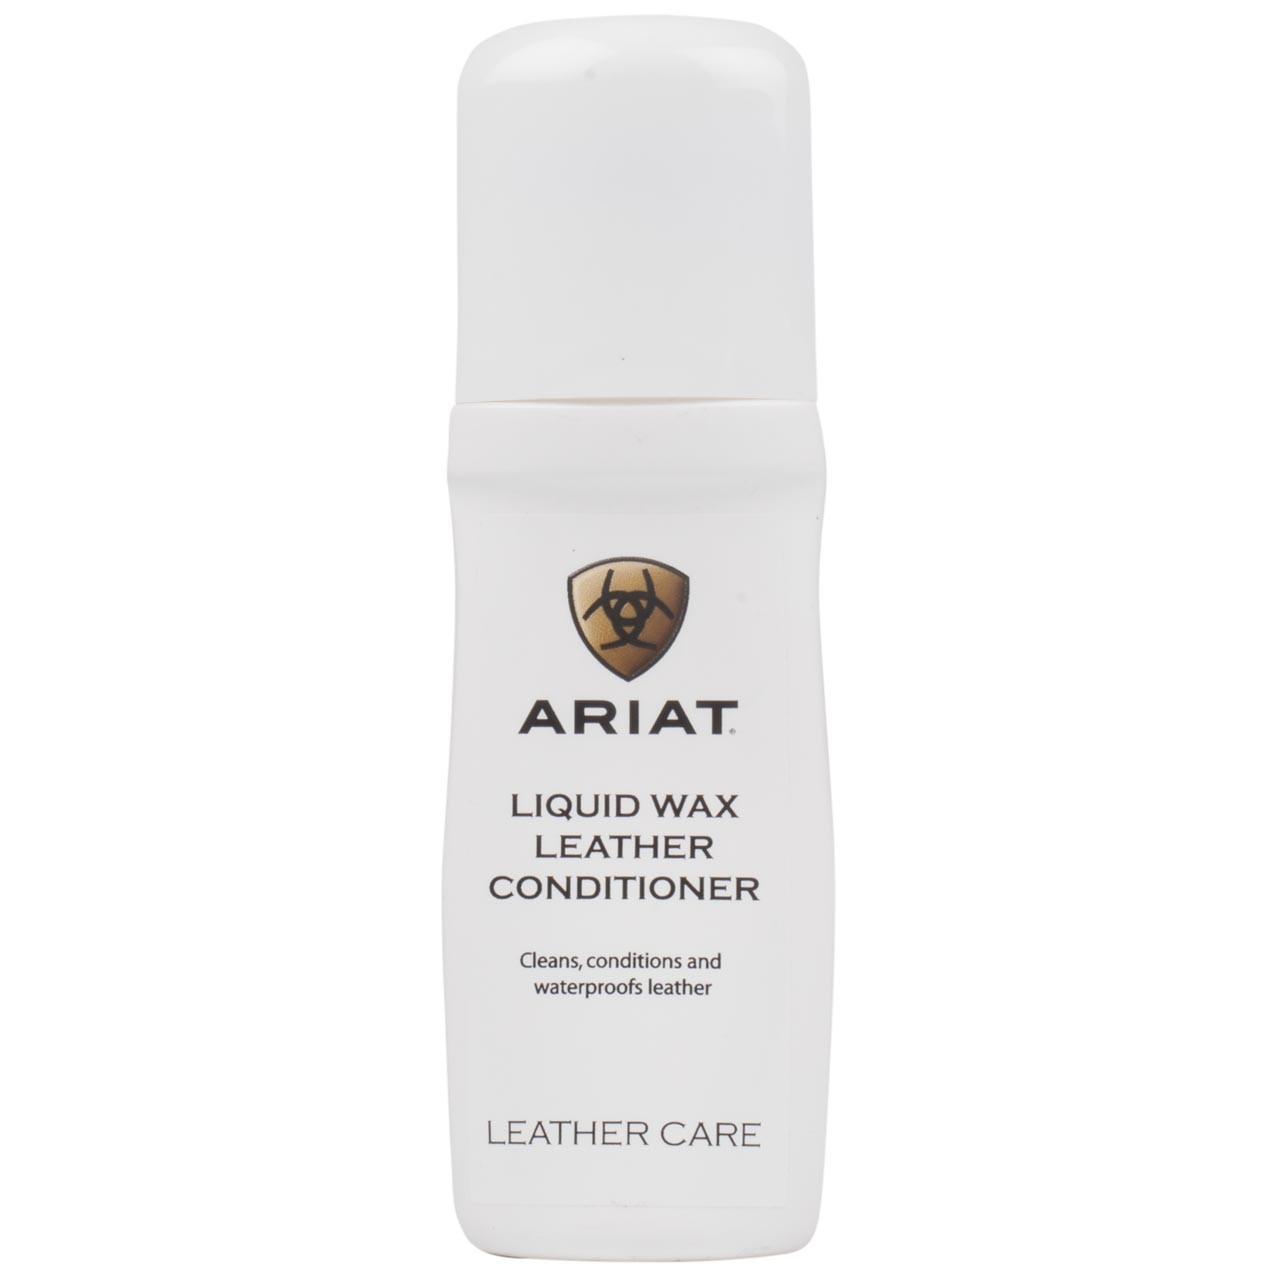 Ariat Liquid wax